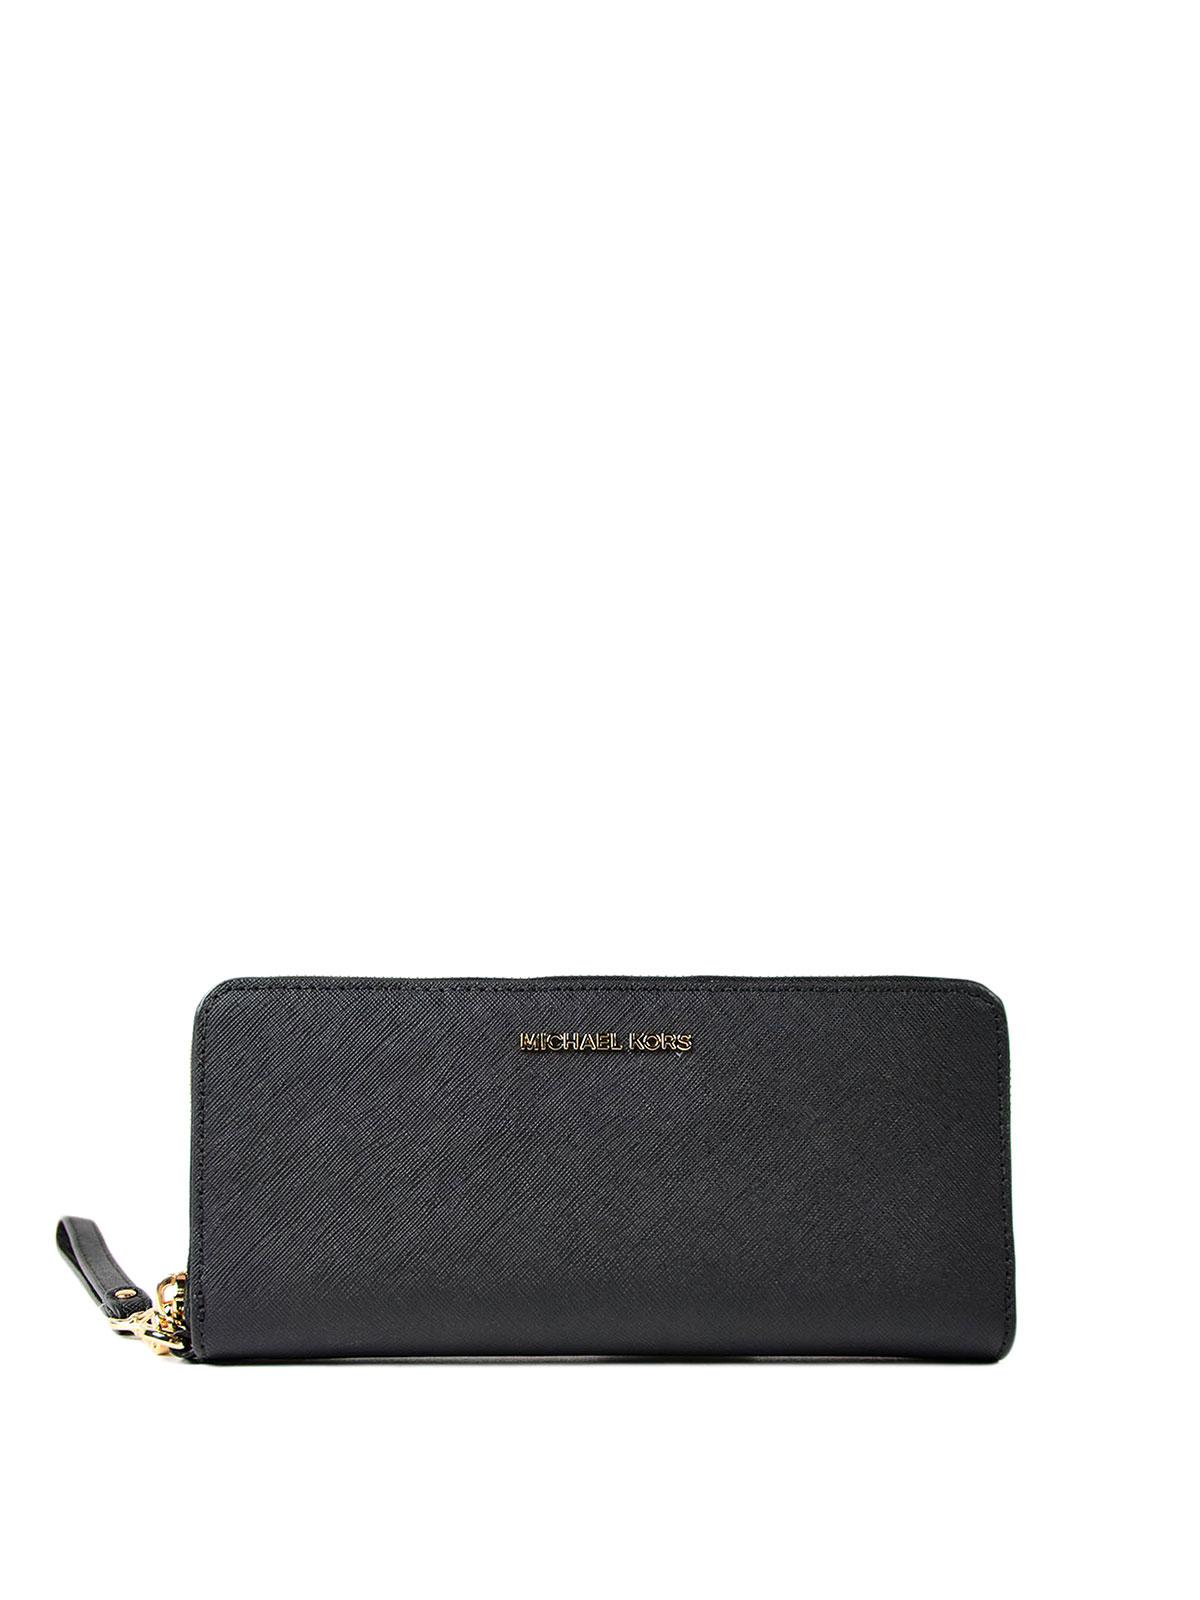 fef7d2833c94 Michael Kors - Jet Set Travel black wallet - wallets & purses ...